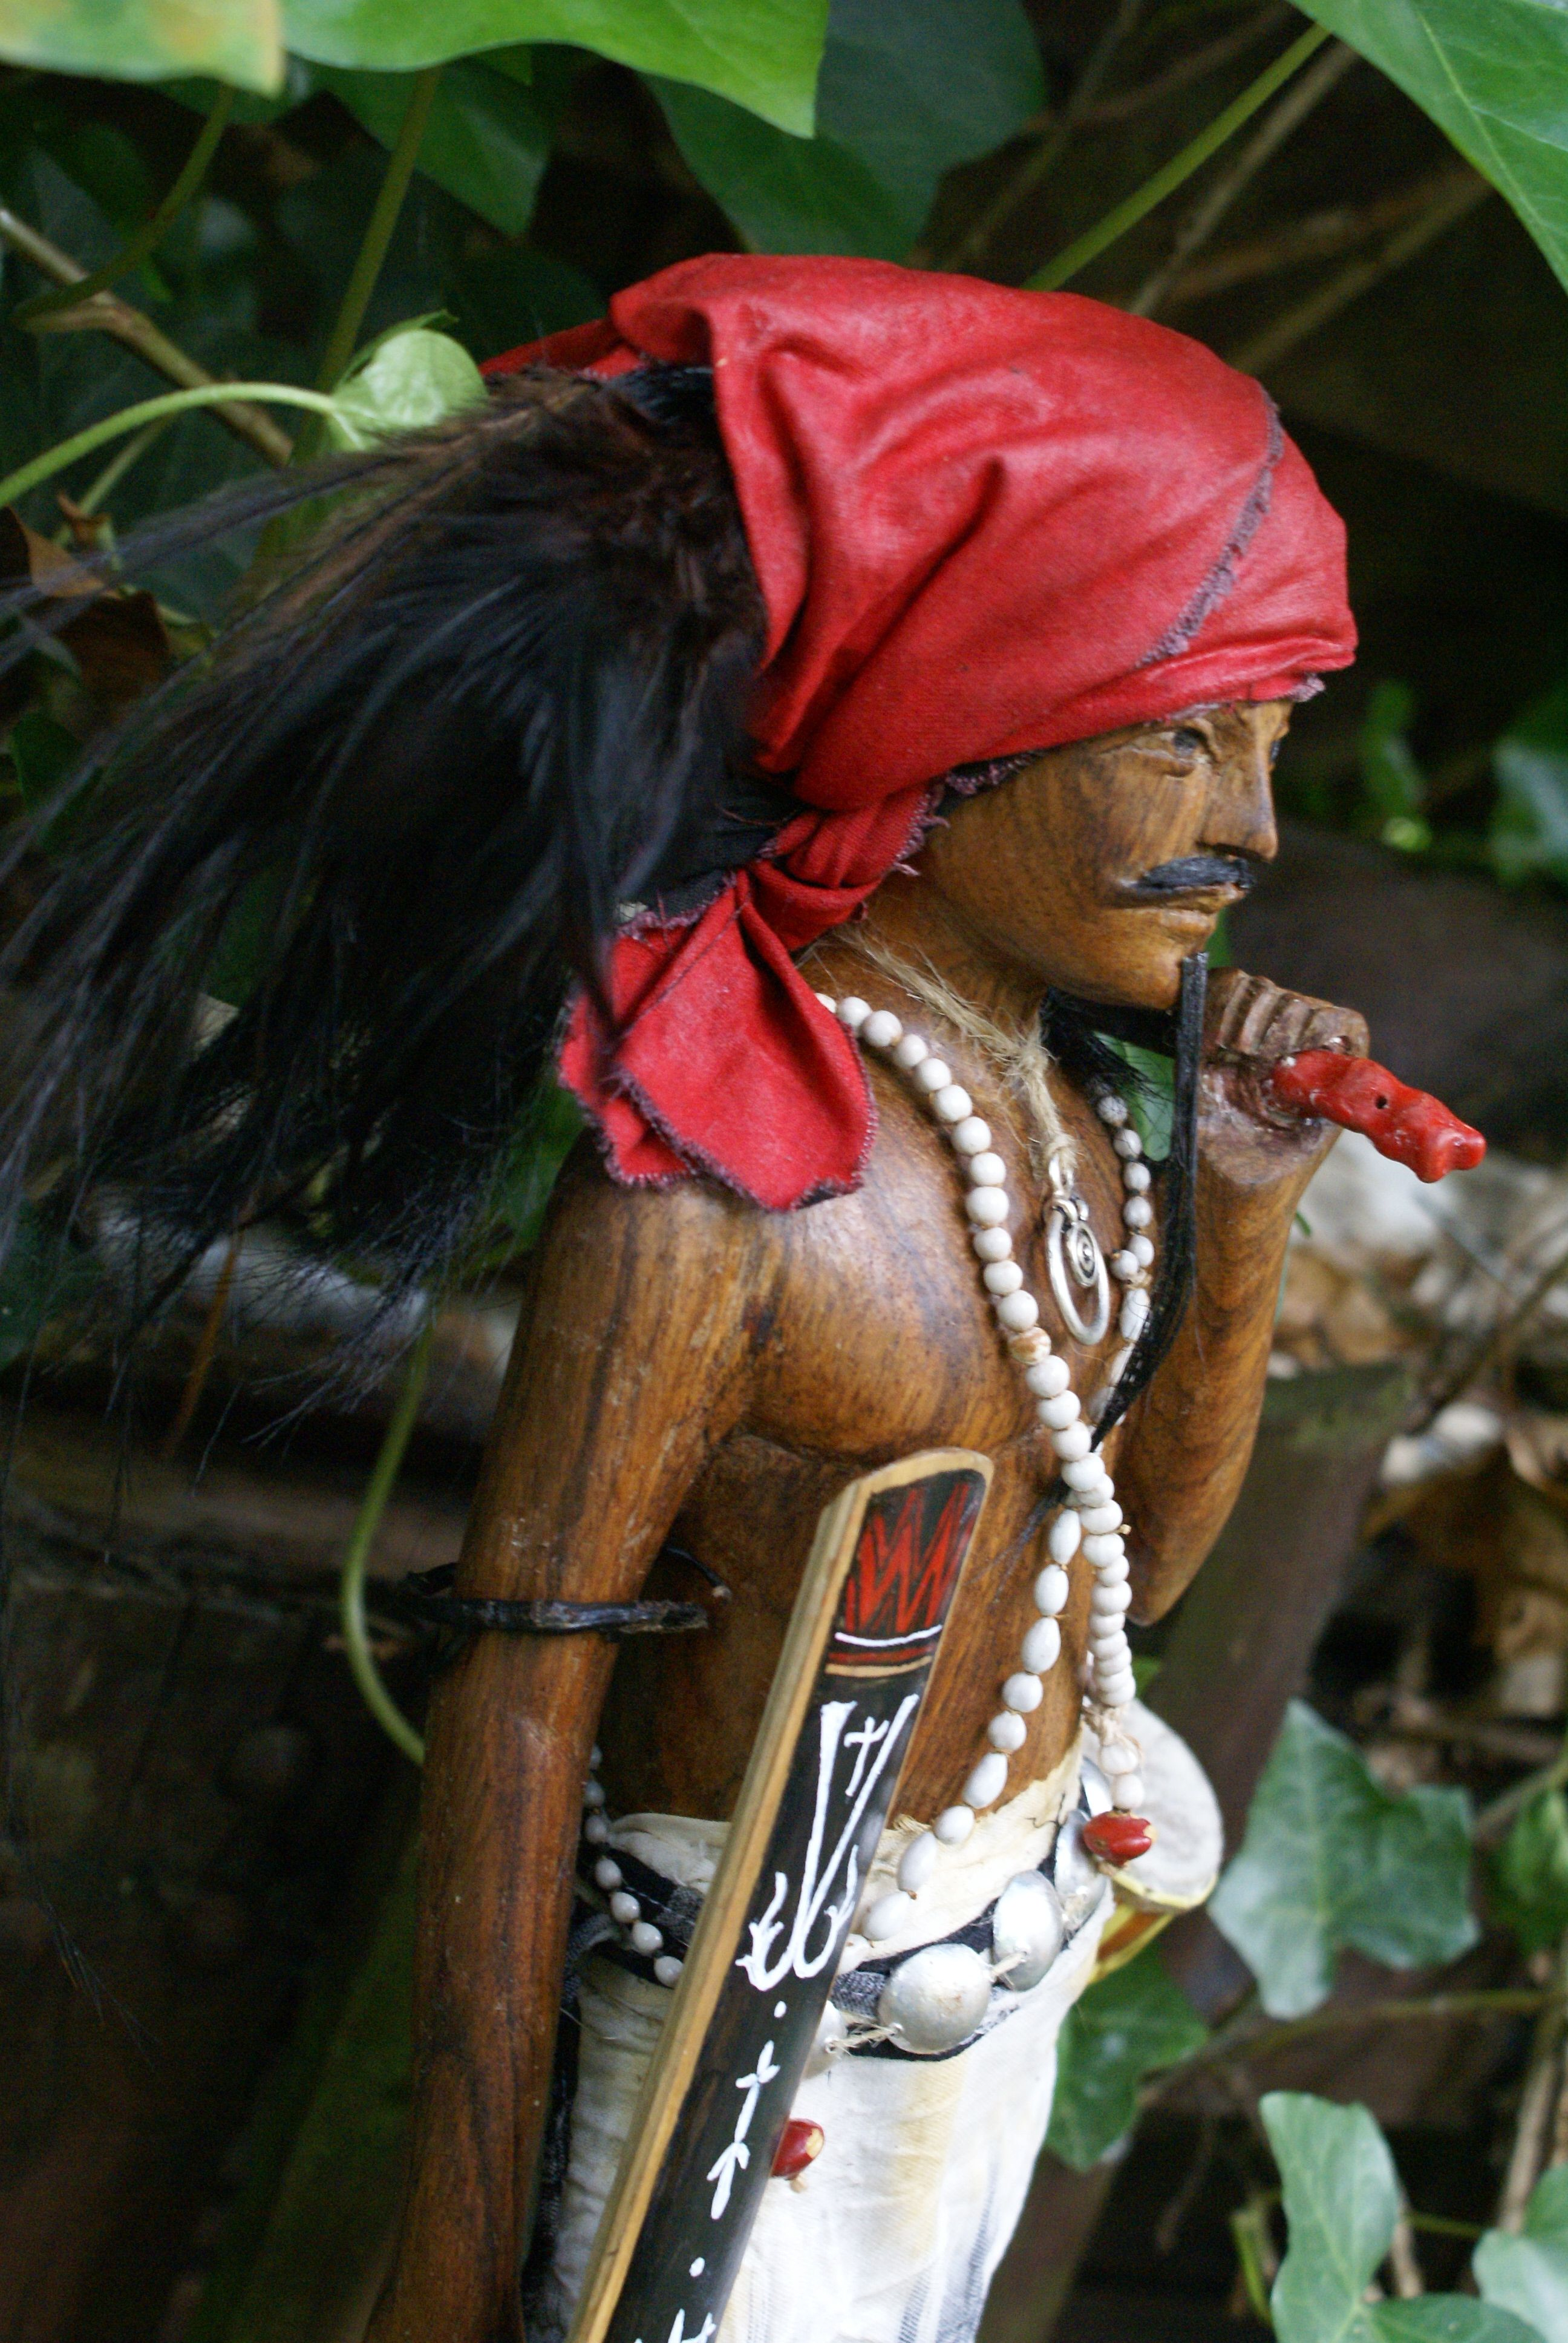 Alifoeroe Miniature Dorina Sedoeboen Molukken Pinterest Pantai Wasisil Kab Maluku